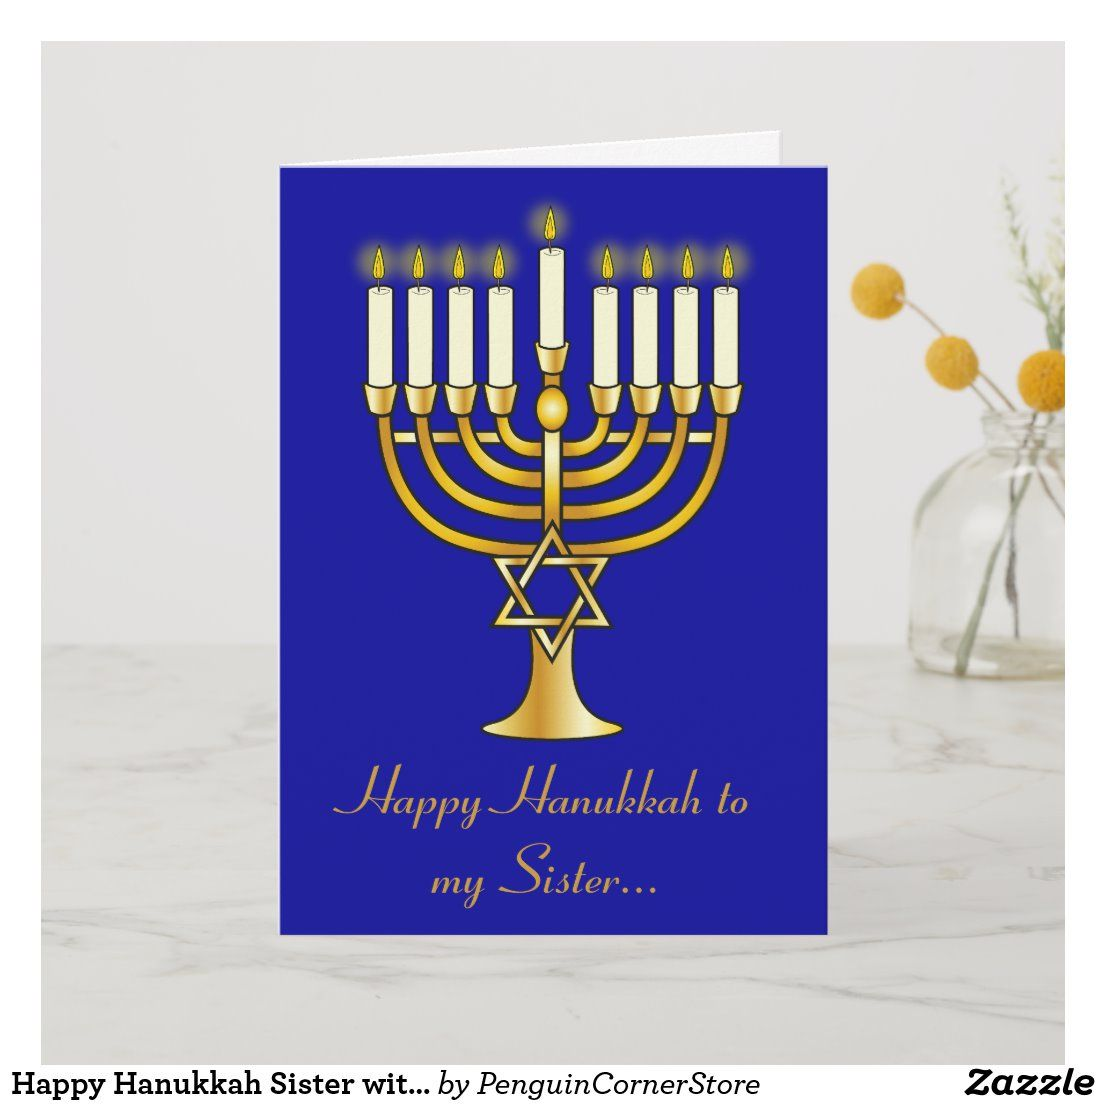 Happy Hanukkah Sister With Menorah Holiday Card